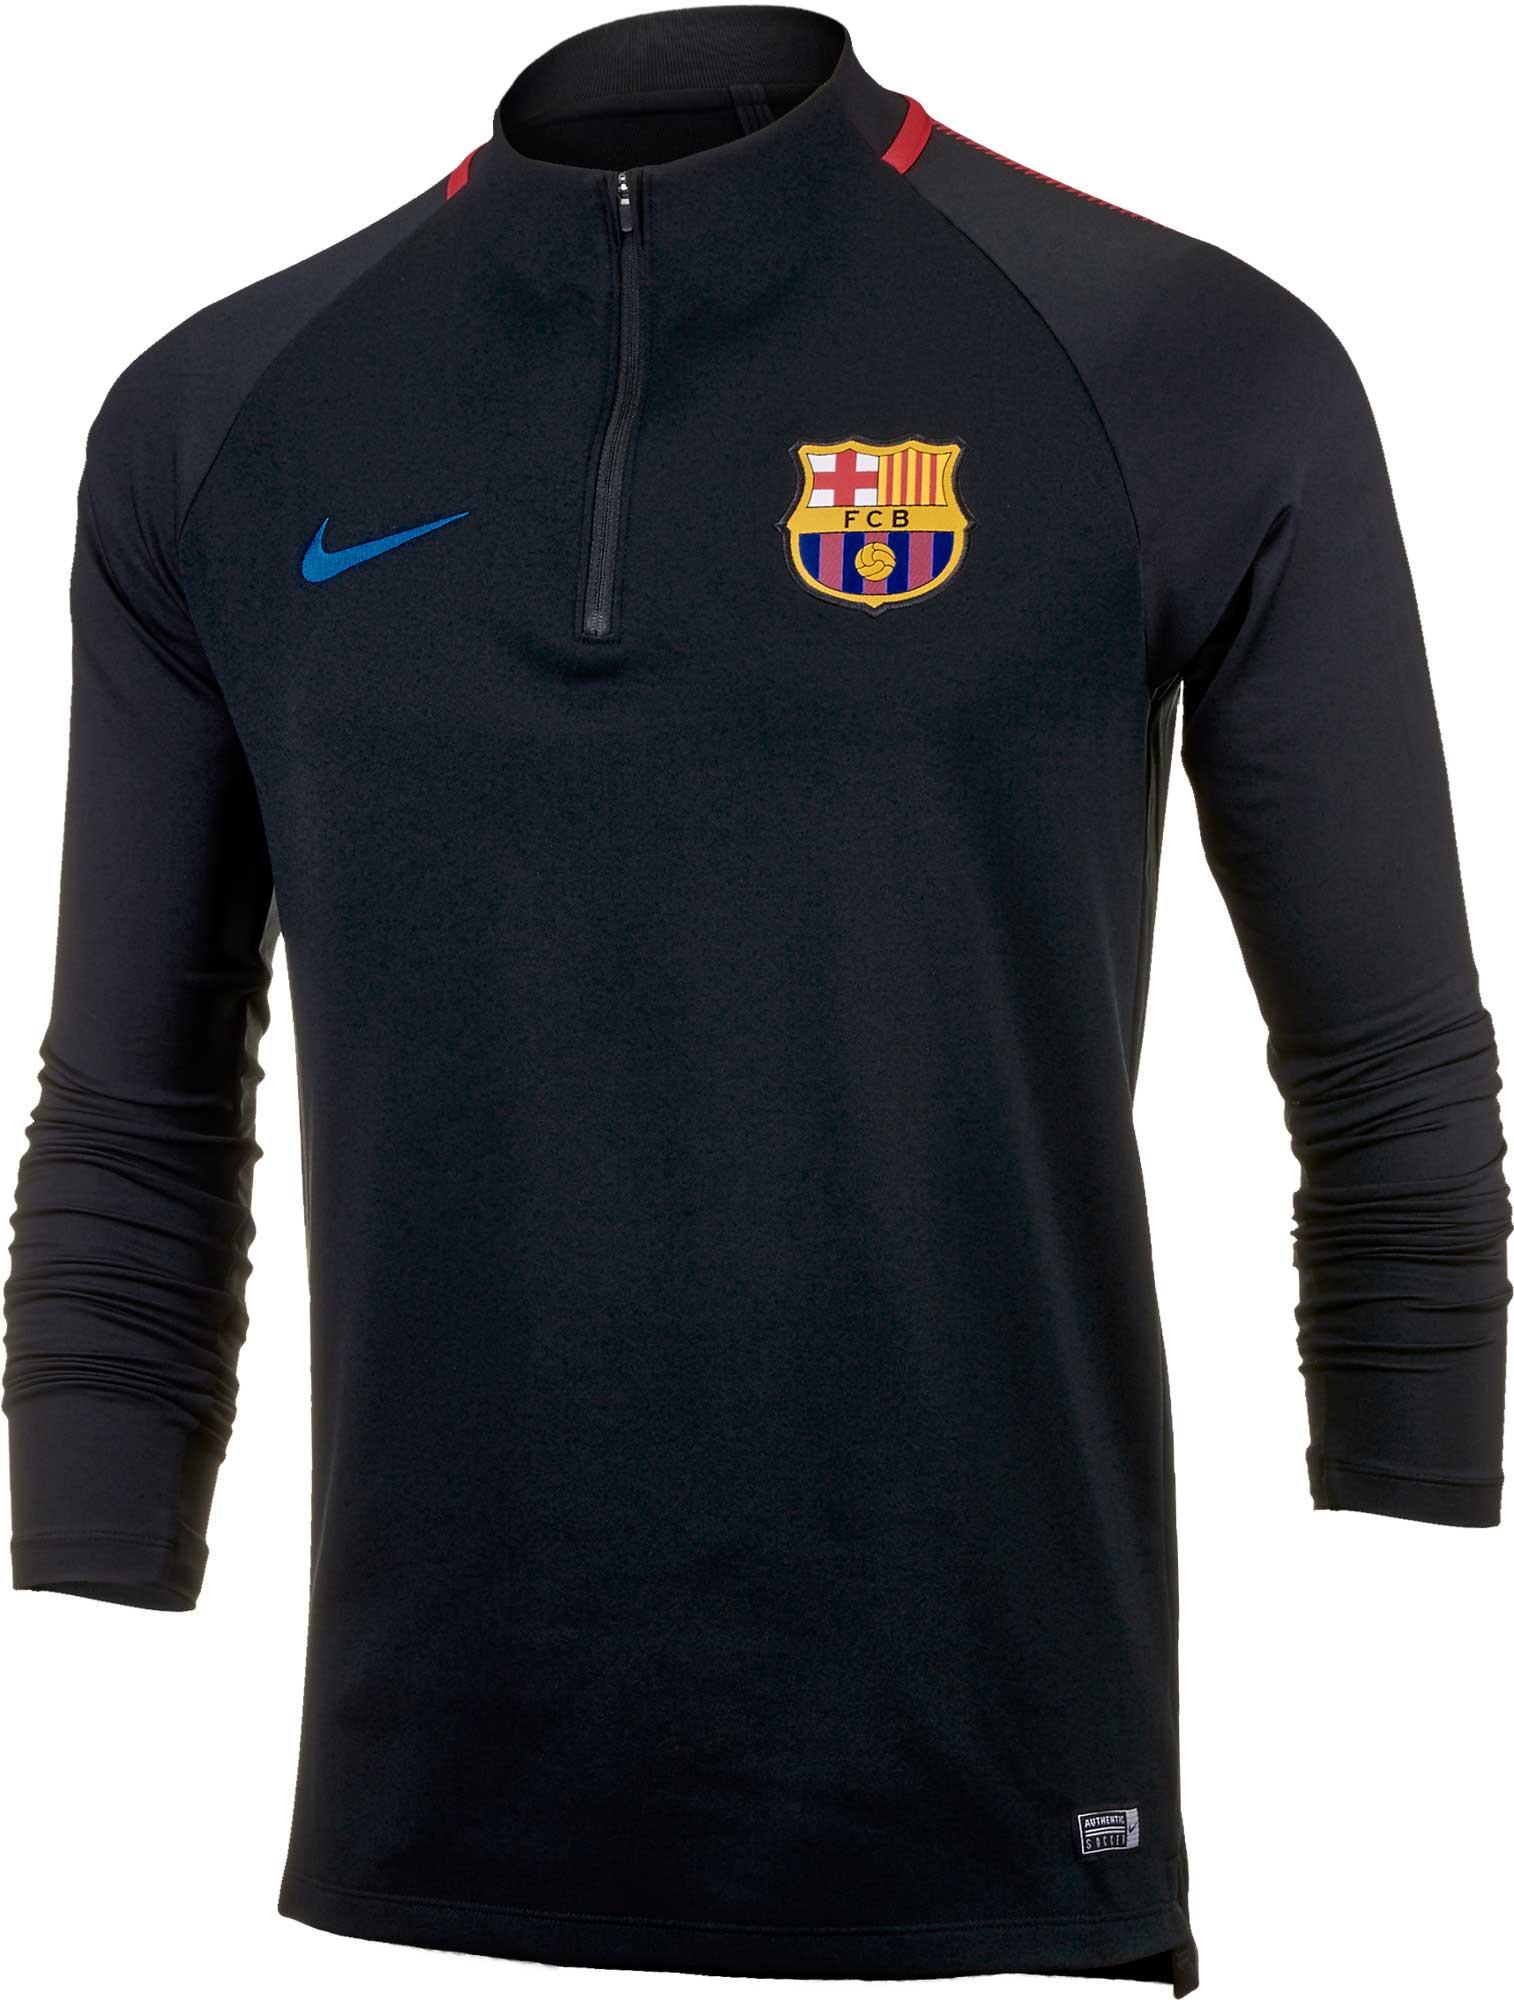 64b777cd386 Nike Barcelona Squad Drill Top - Black & University Red - Soccer Master